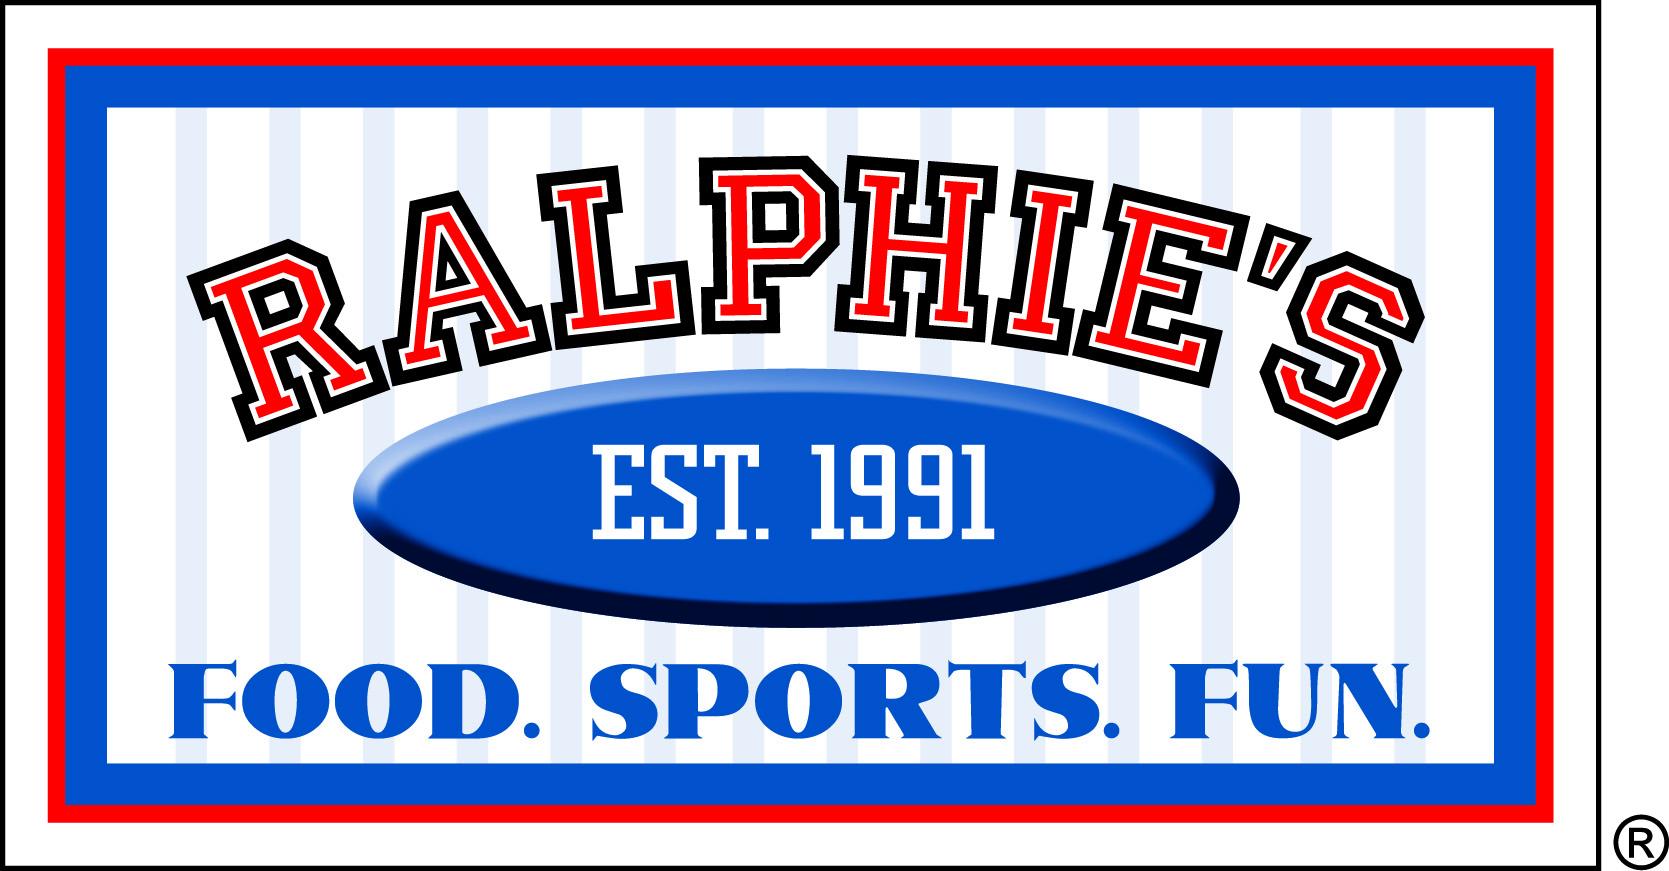 Ralphies.jpg